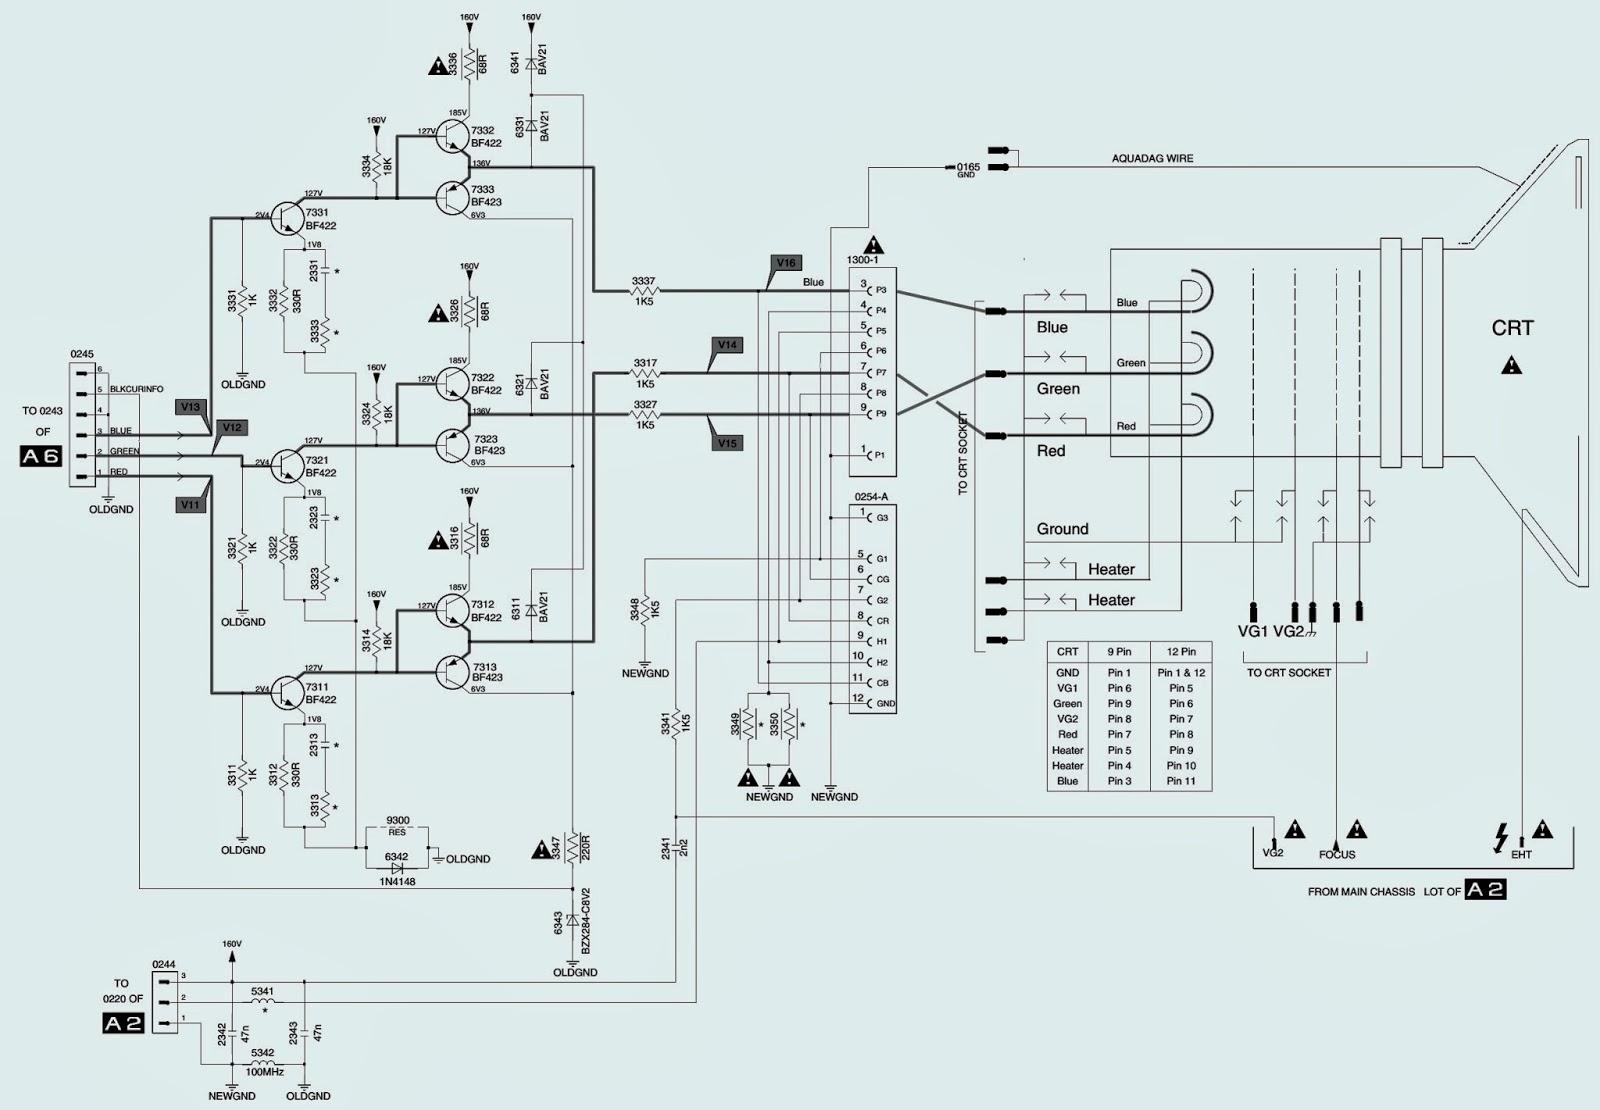 Sonos Sound Bar Wiring Diagram Amf Harley Davidson Golf Cart Samsung Smart Tv Imageresizertool Com